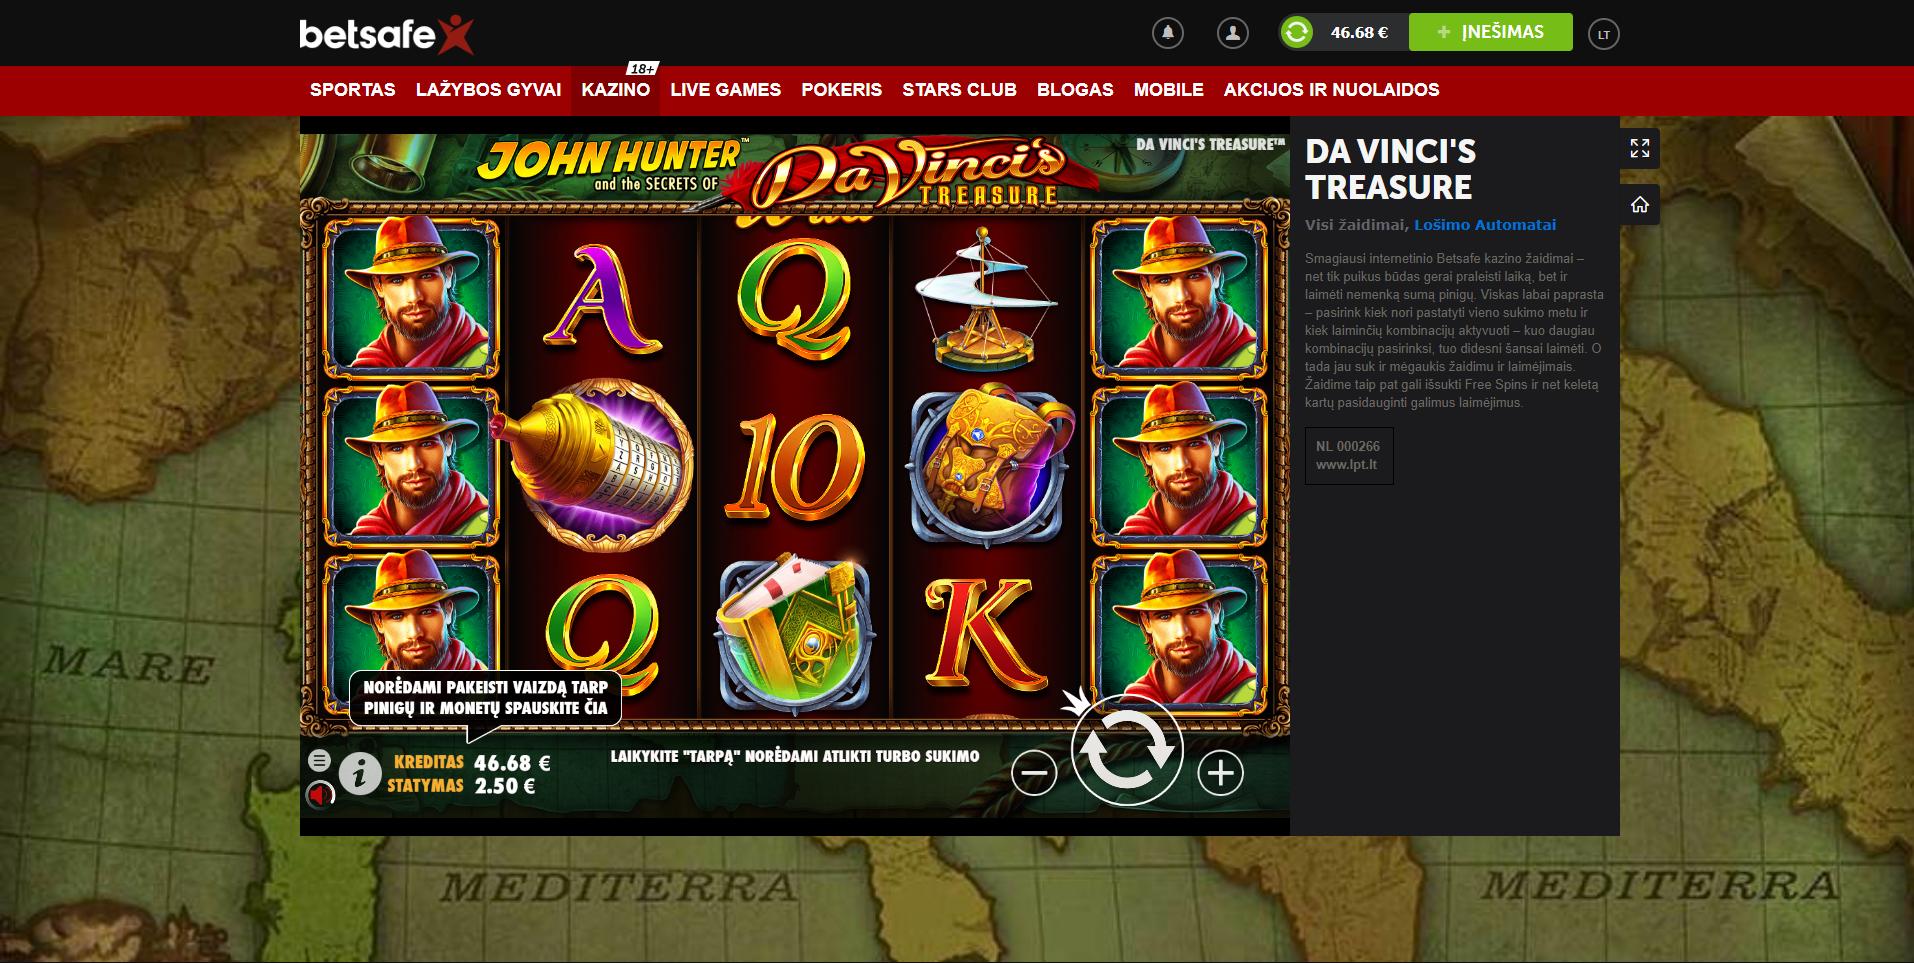 davinci treasure slot betsafe casino pragmatic play